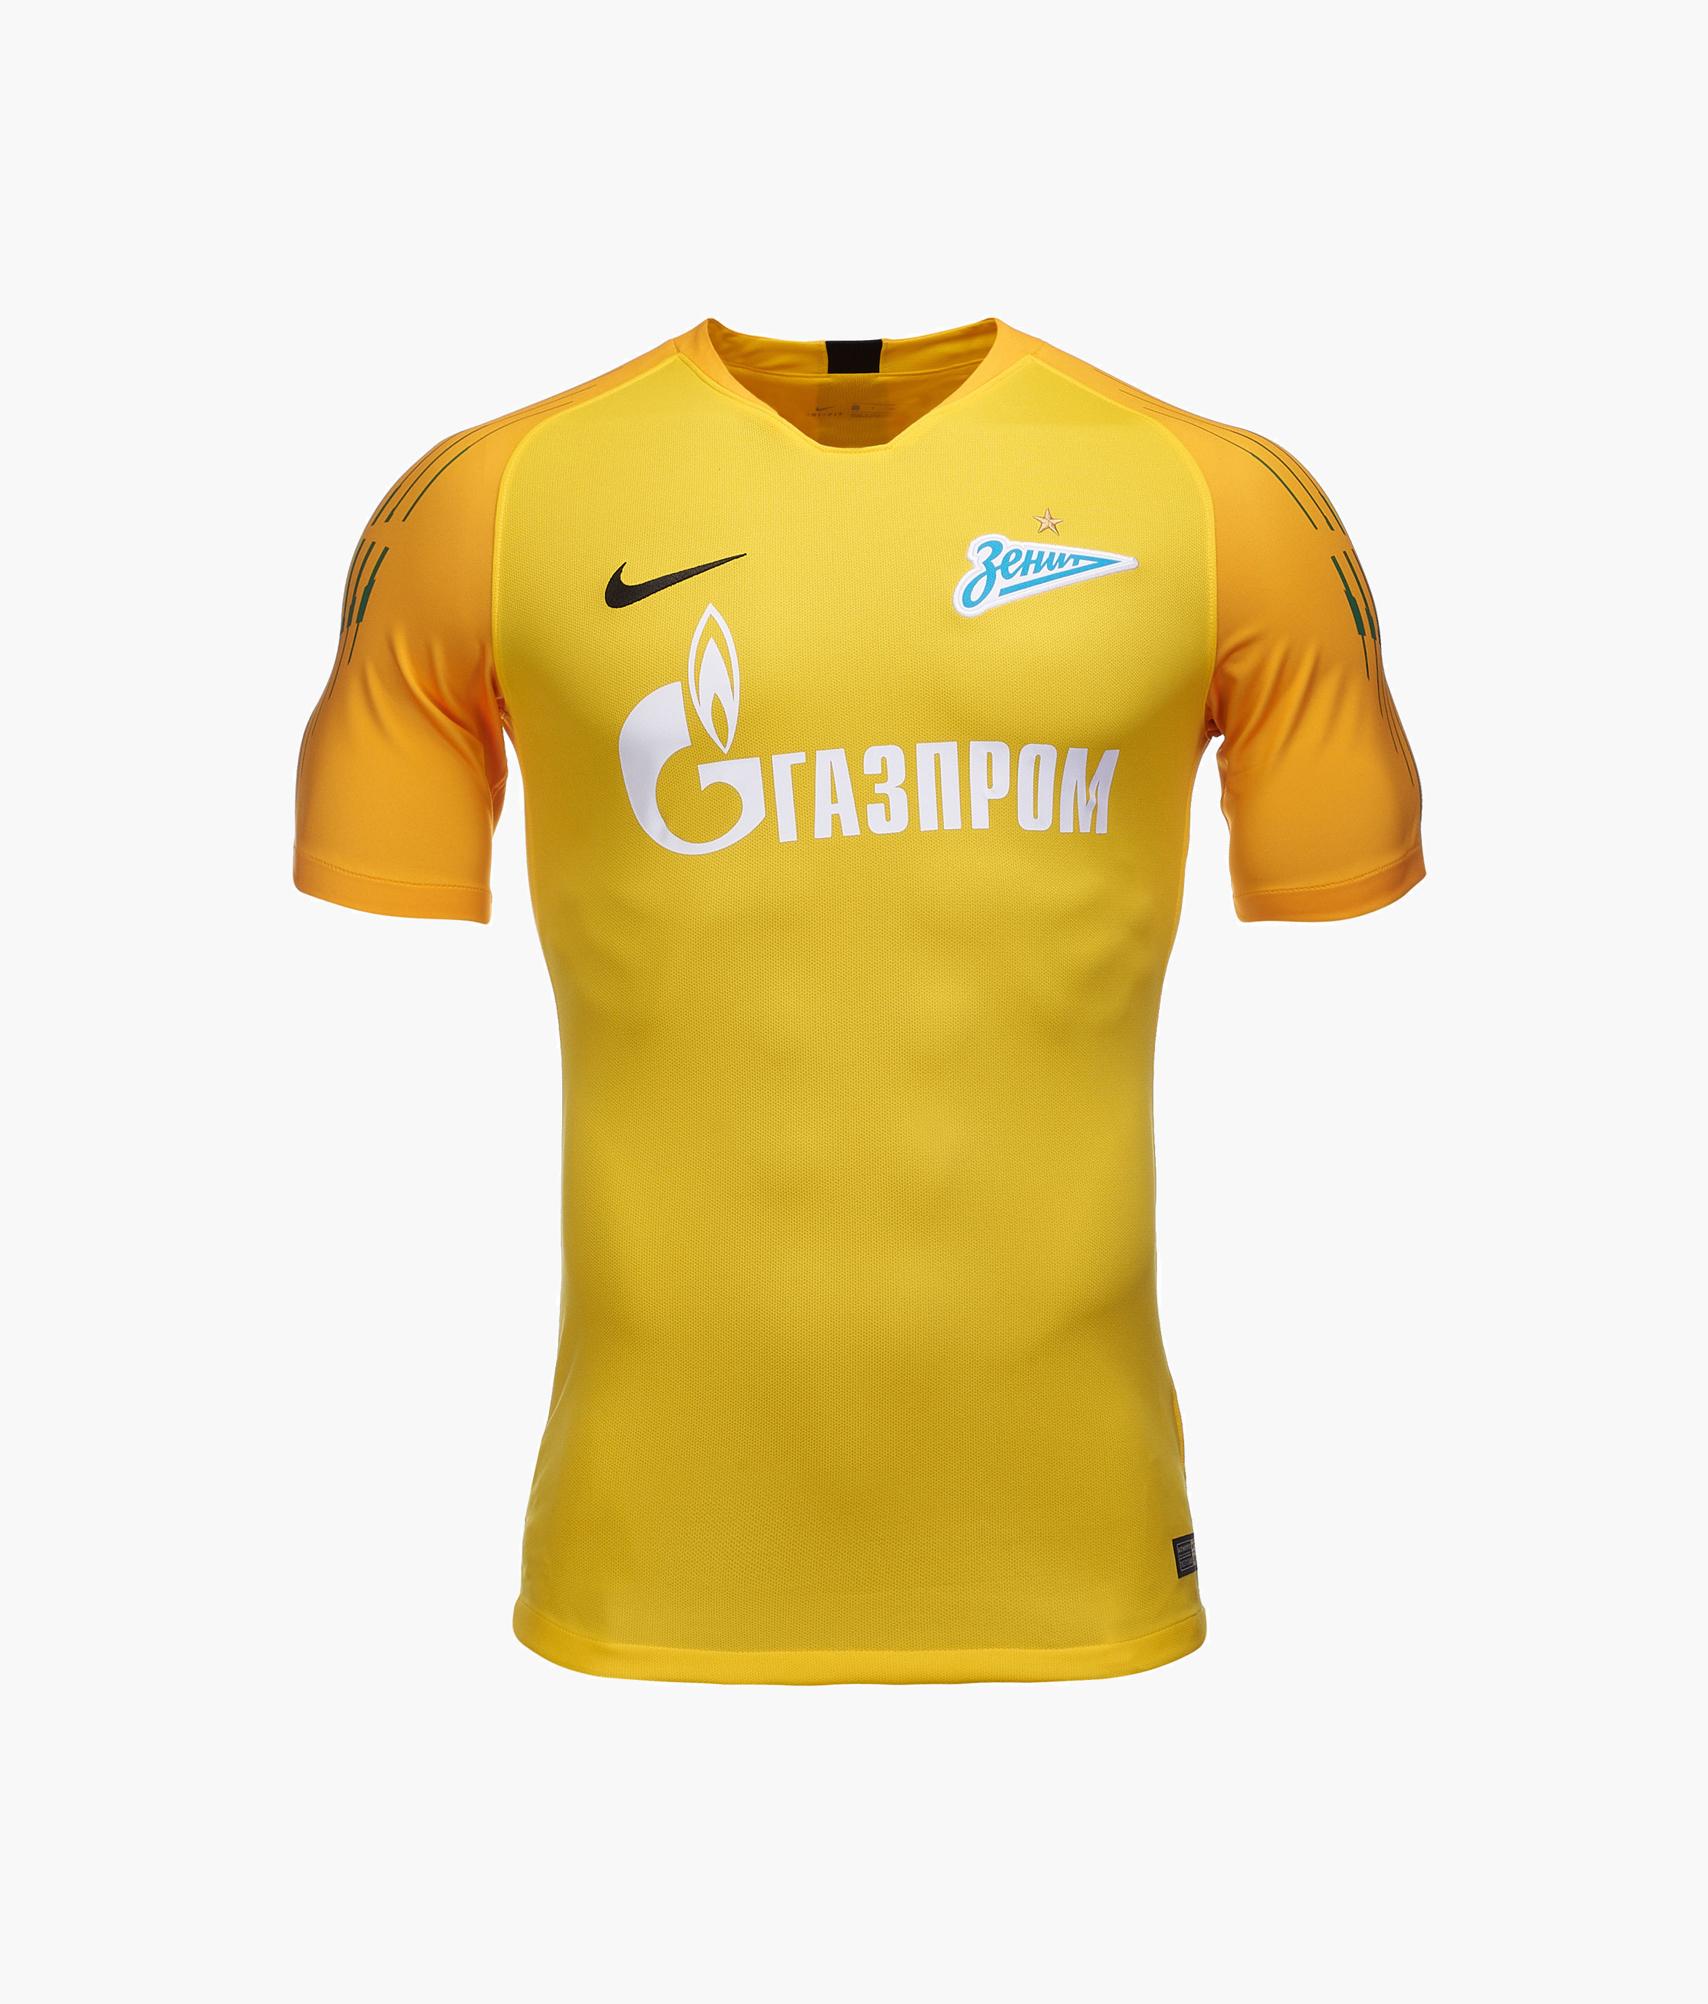 Футболка вратарская сезона 2018/2019 Nike Цвет-Желтый